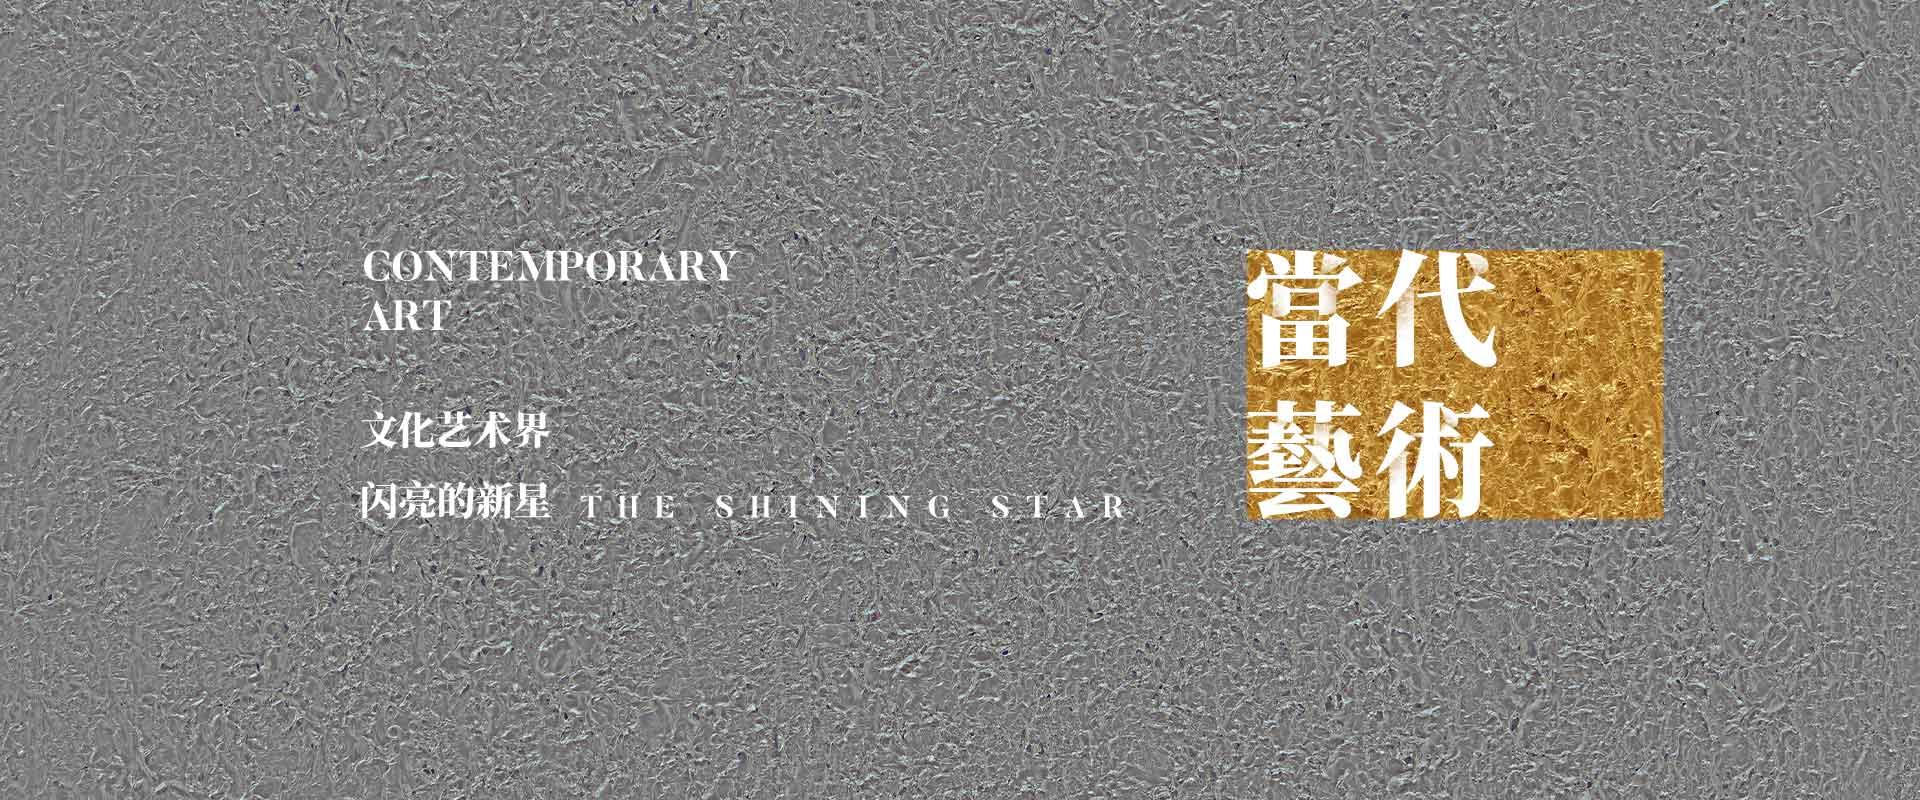 YJ严颉,当代艺术,文化艺术界闪亮的新星